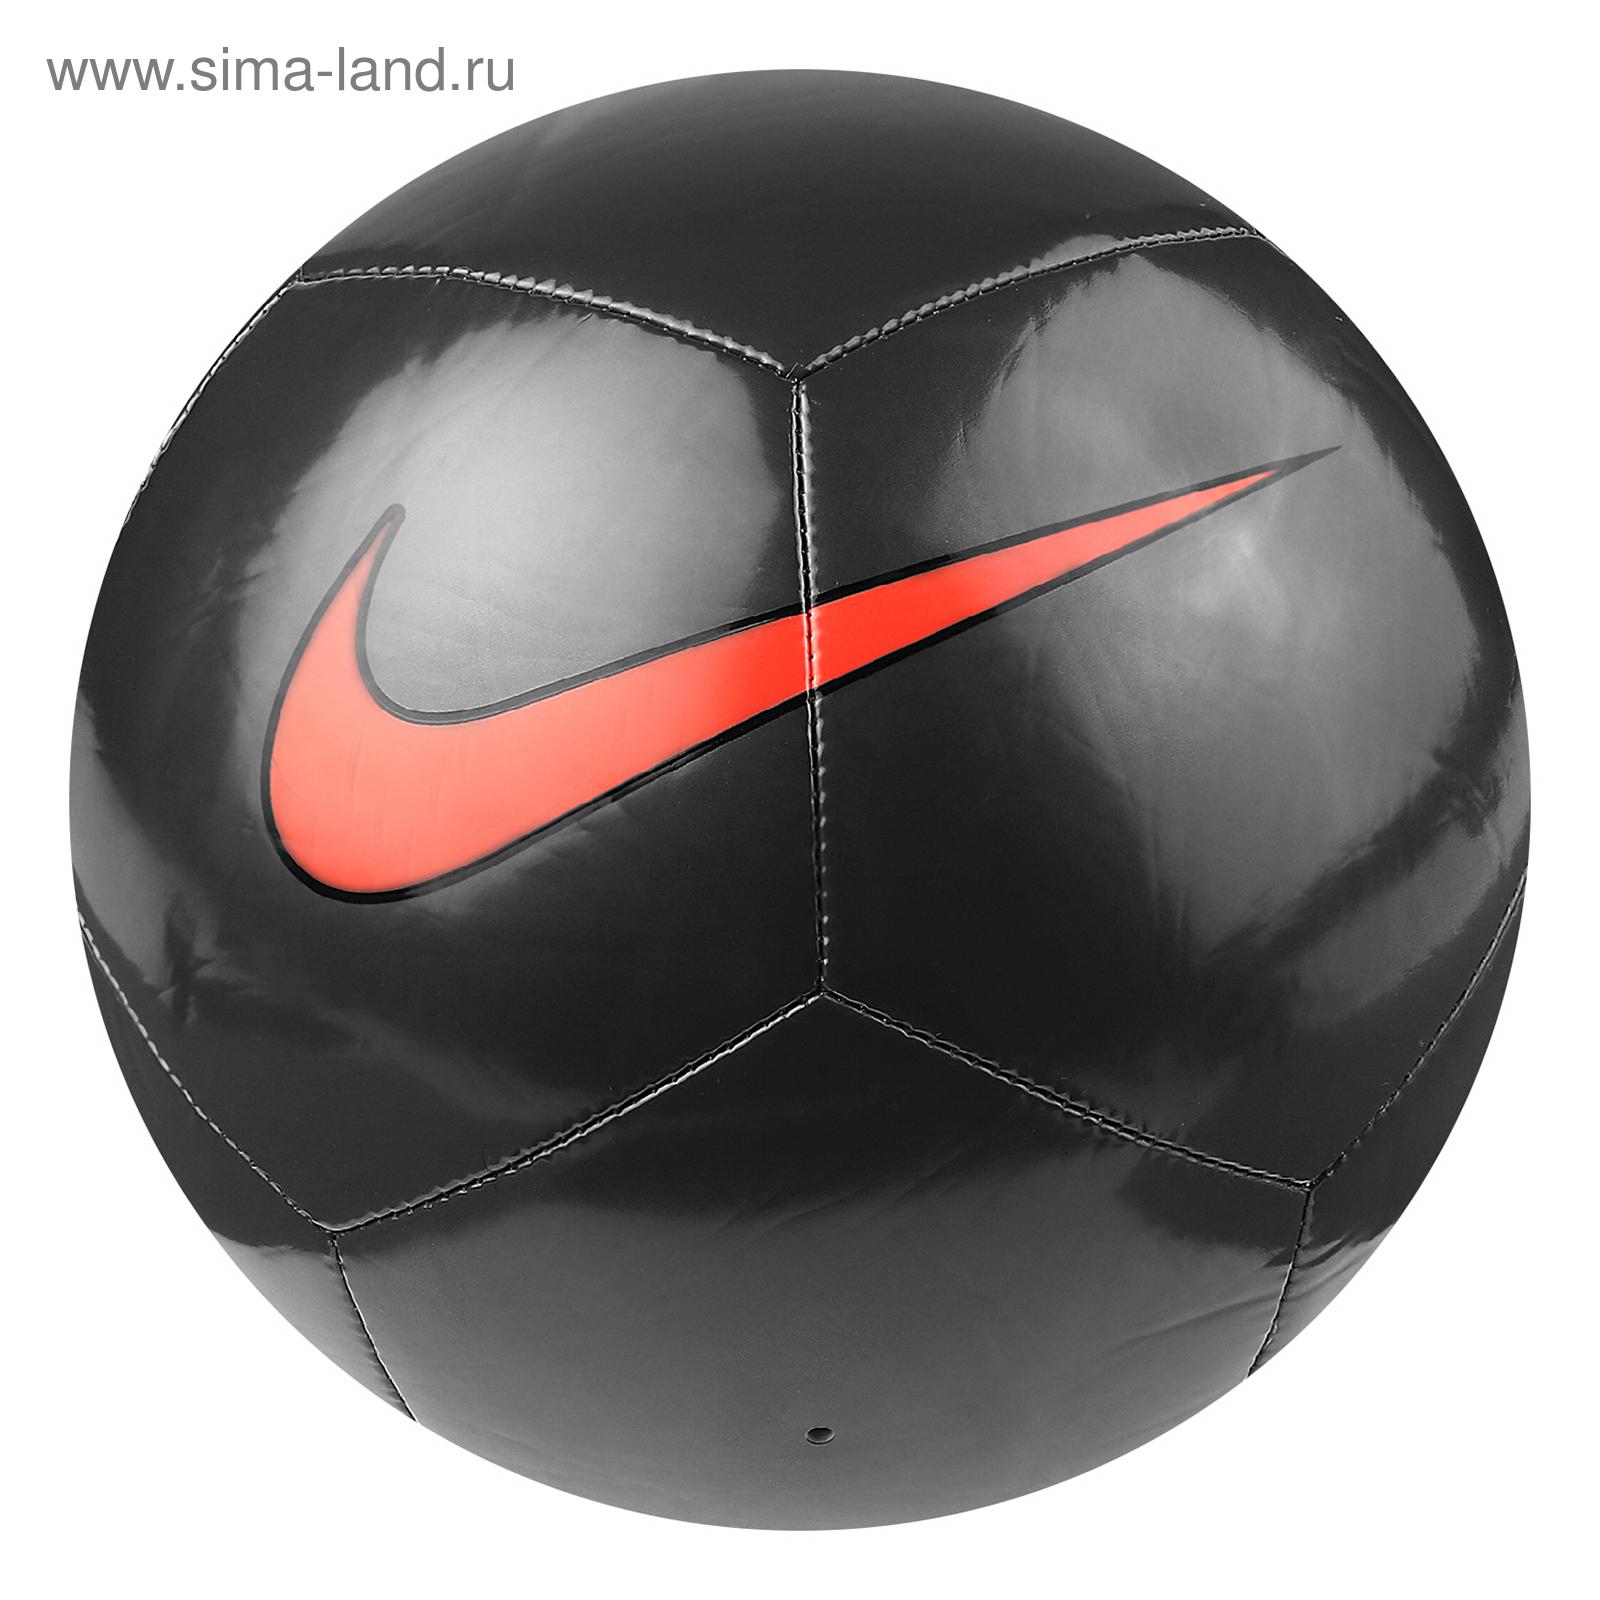 ab14bed8 Мяч футбольный NIKE Pitch Training, SC3101-008, размер 5, 12 панелей ...